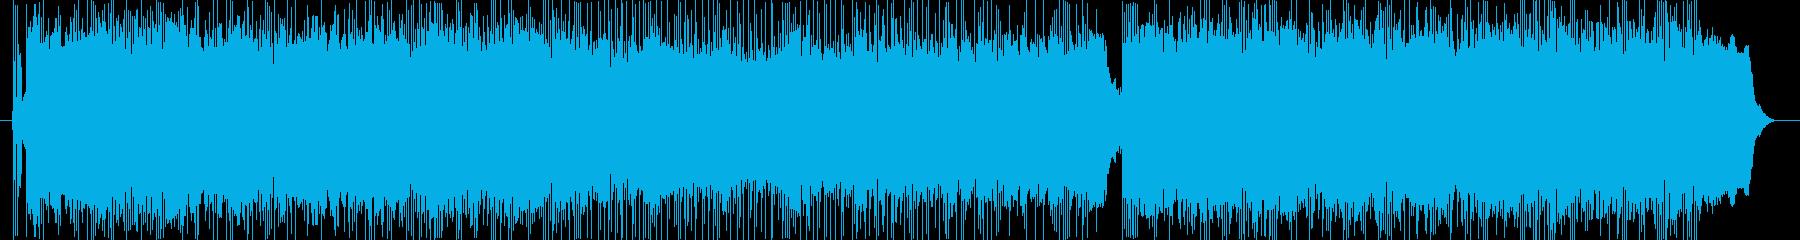 SFチックな戦闘曲の再生済みの波形